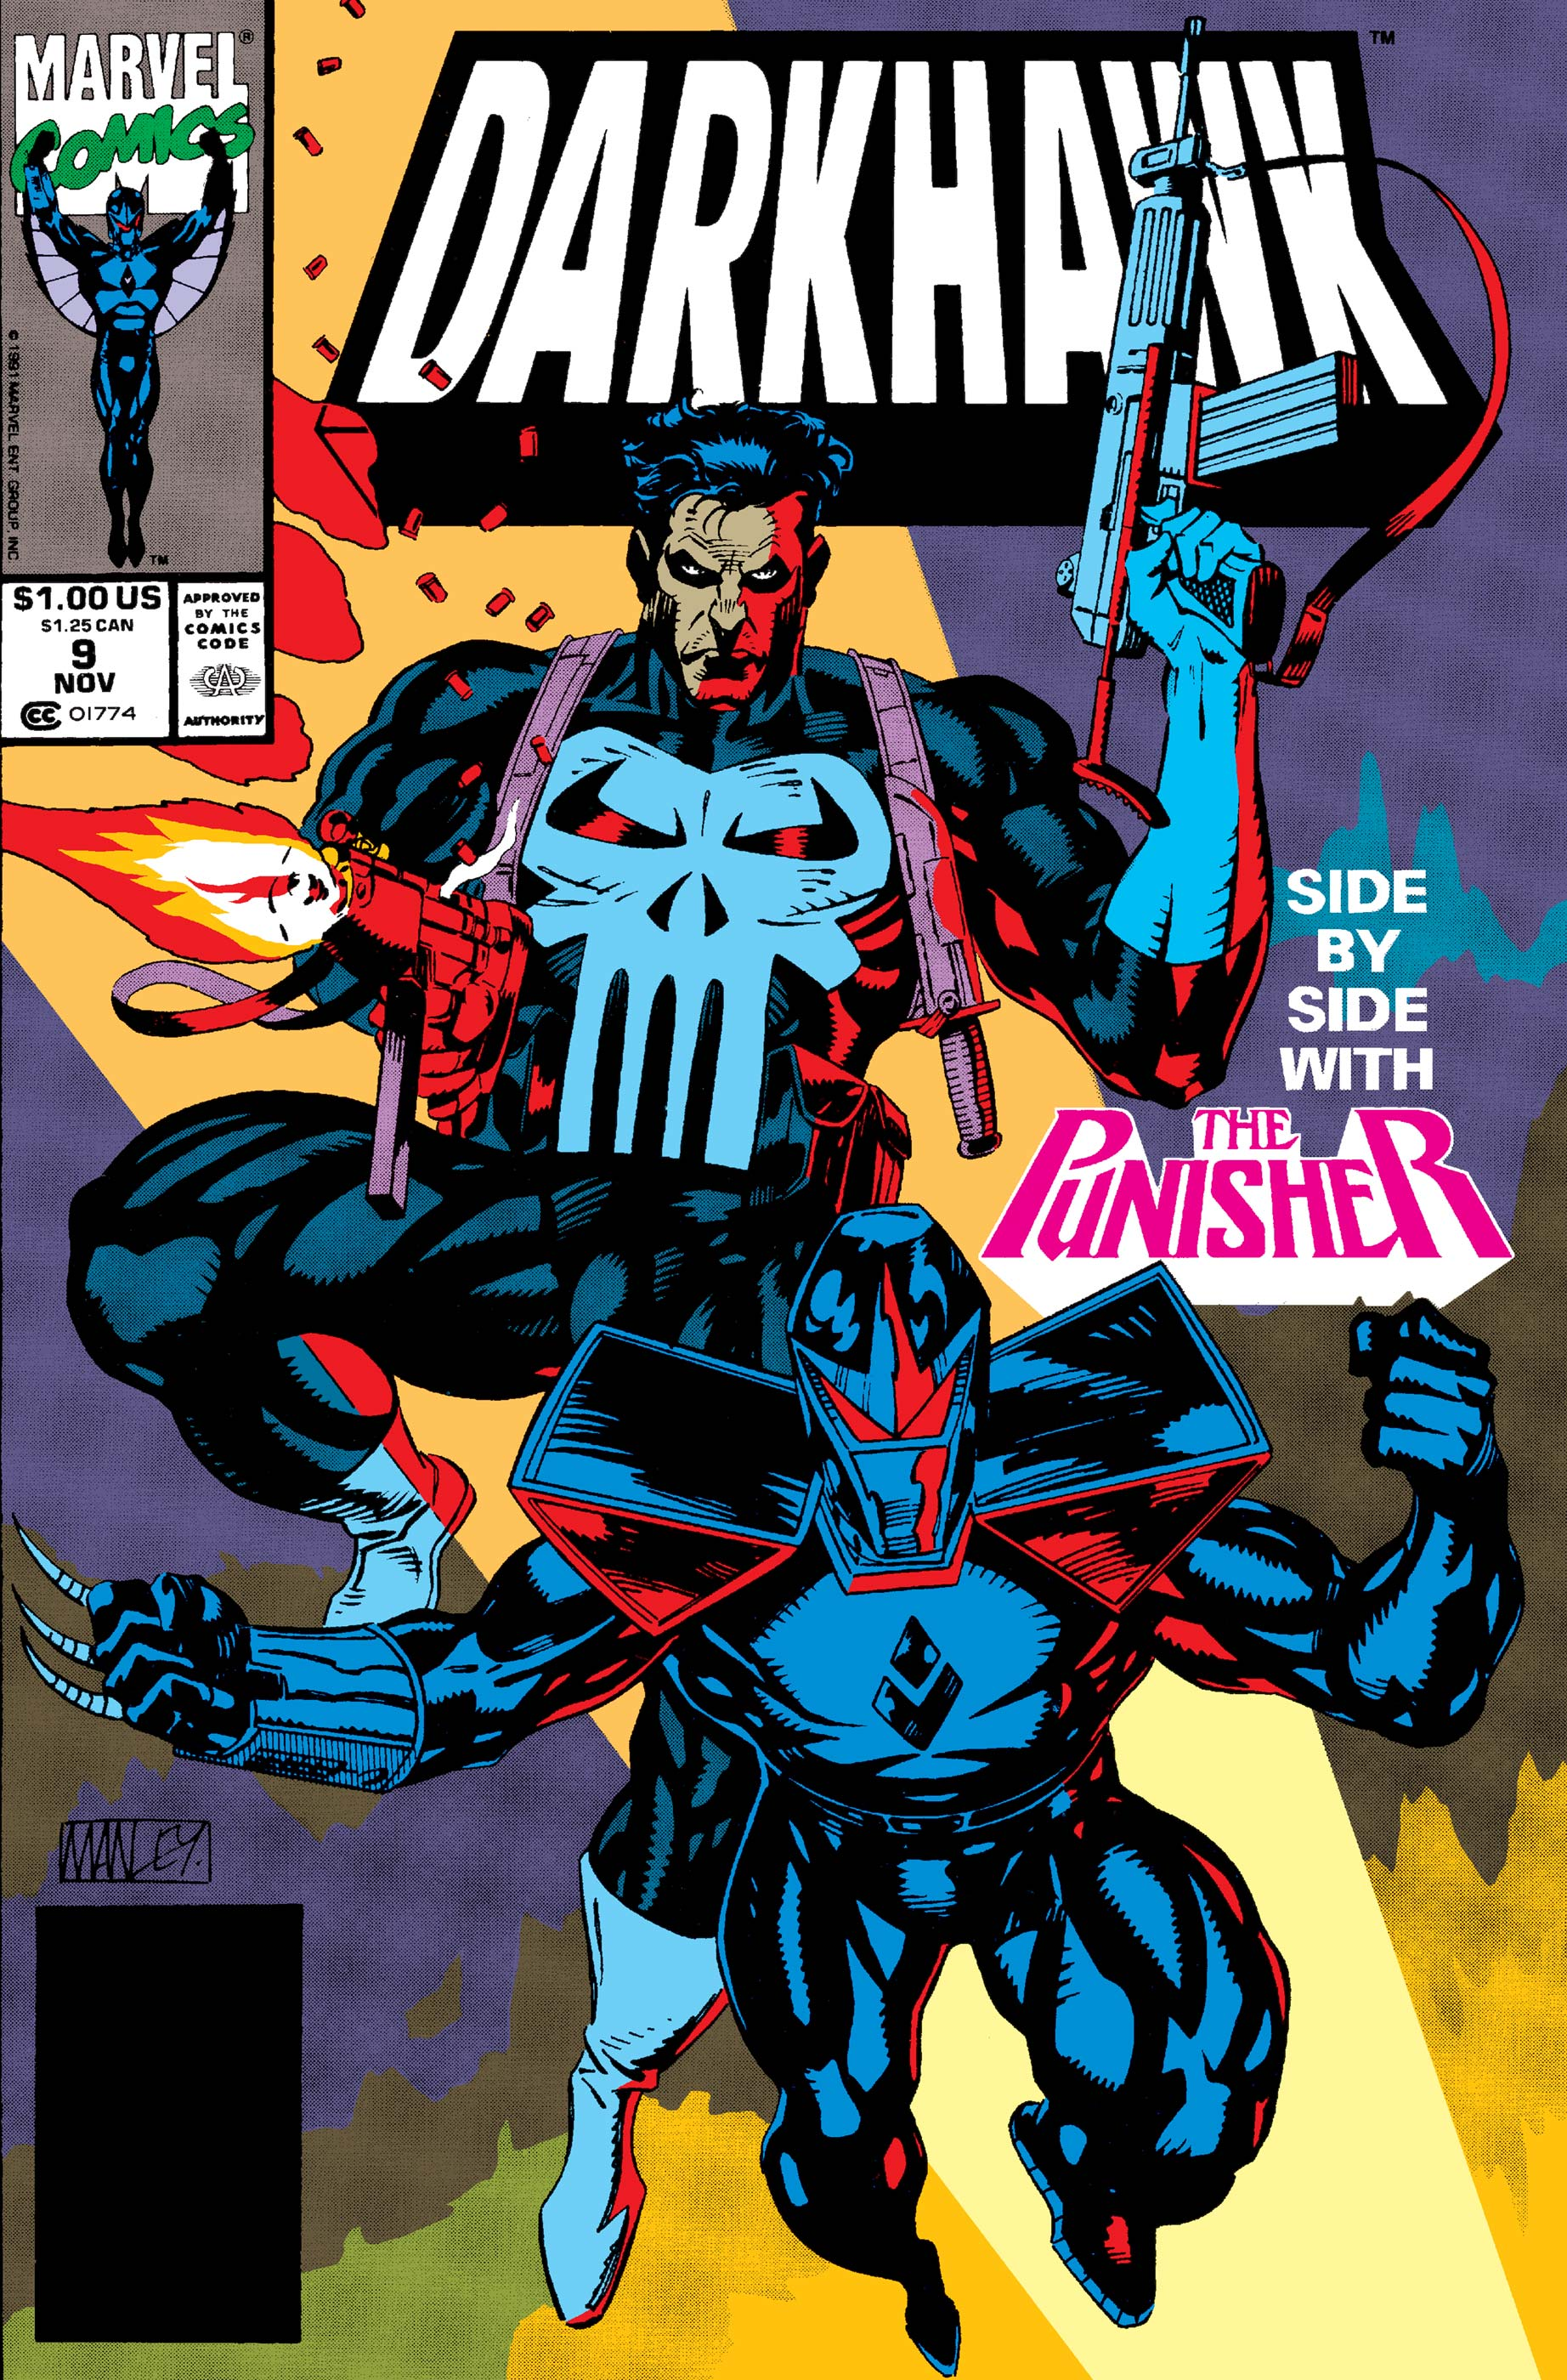 Darkhawk (1991) #9